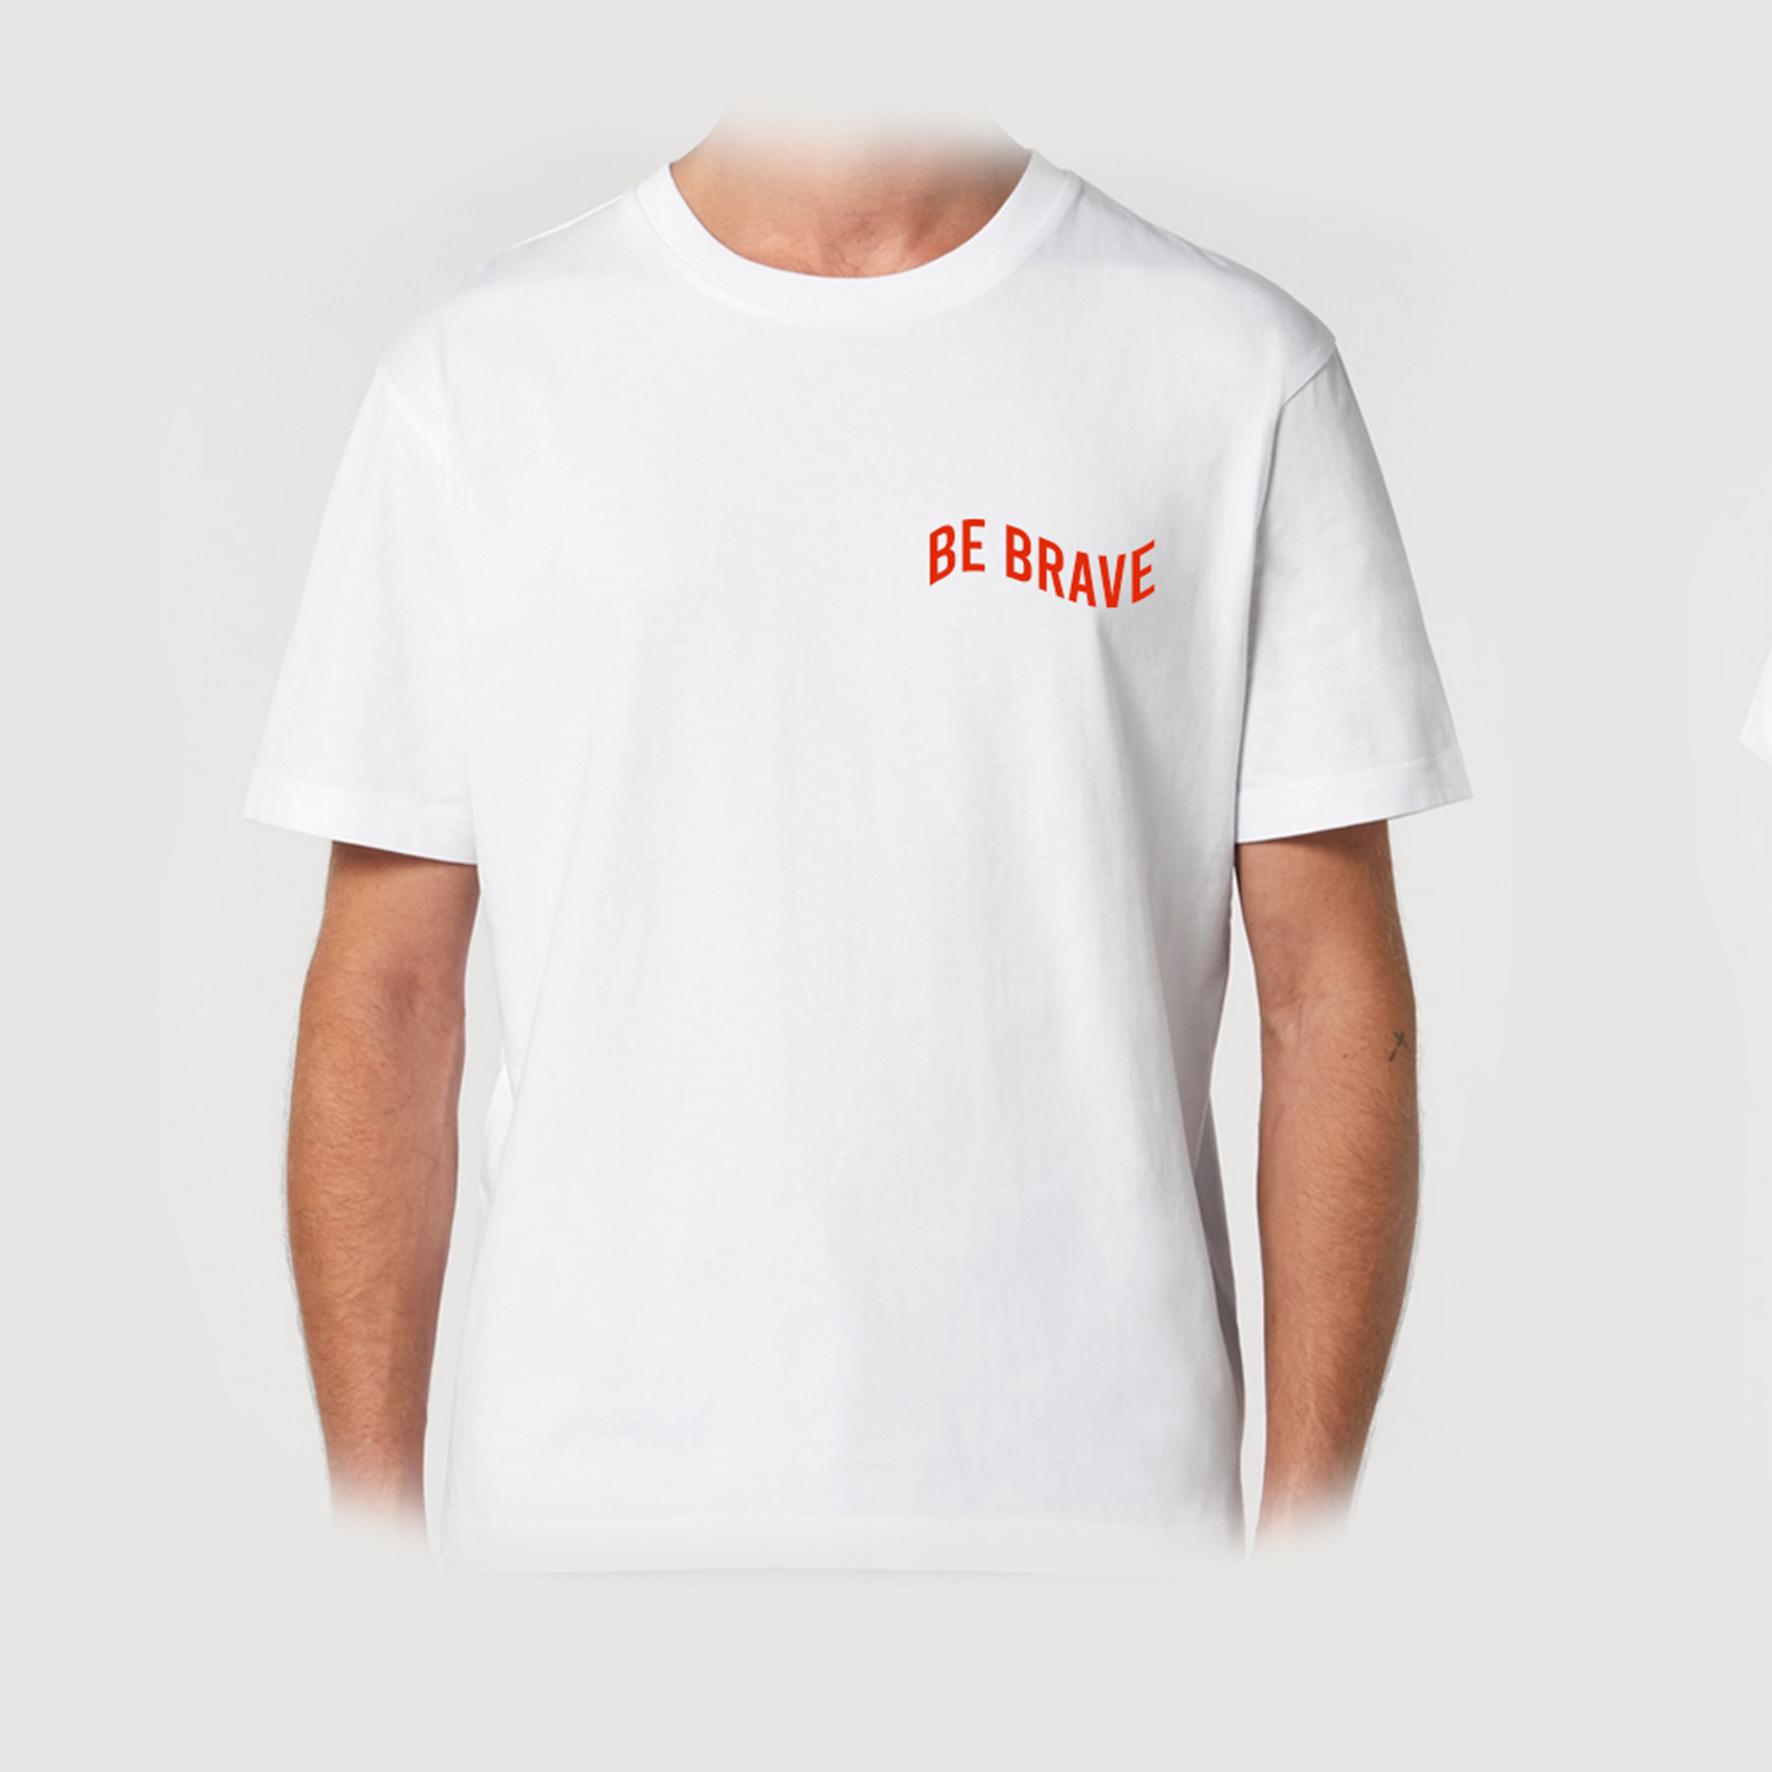 T-shirt biały BE BRAVE RED